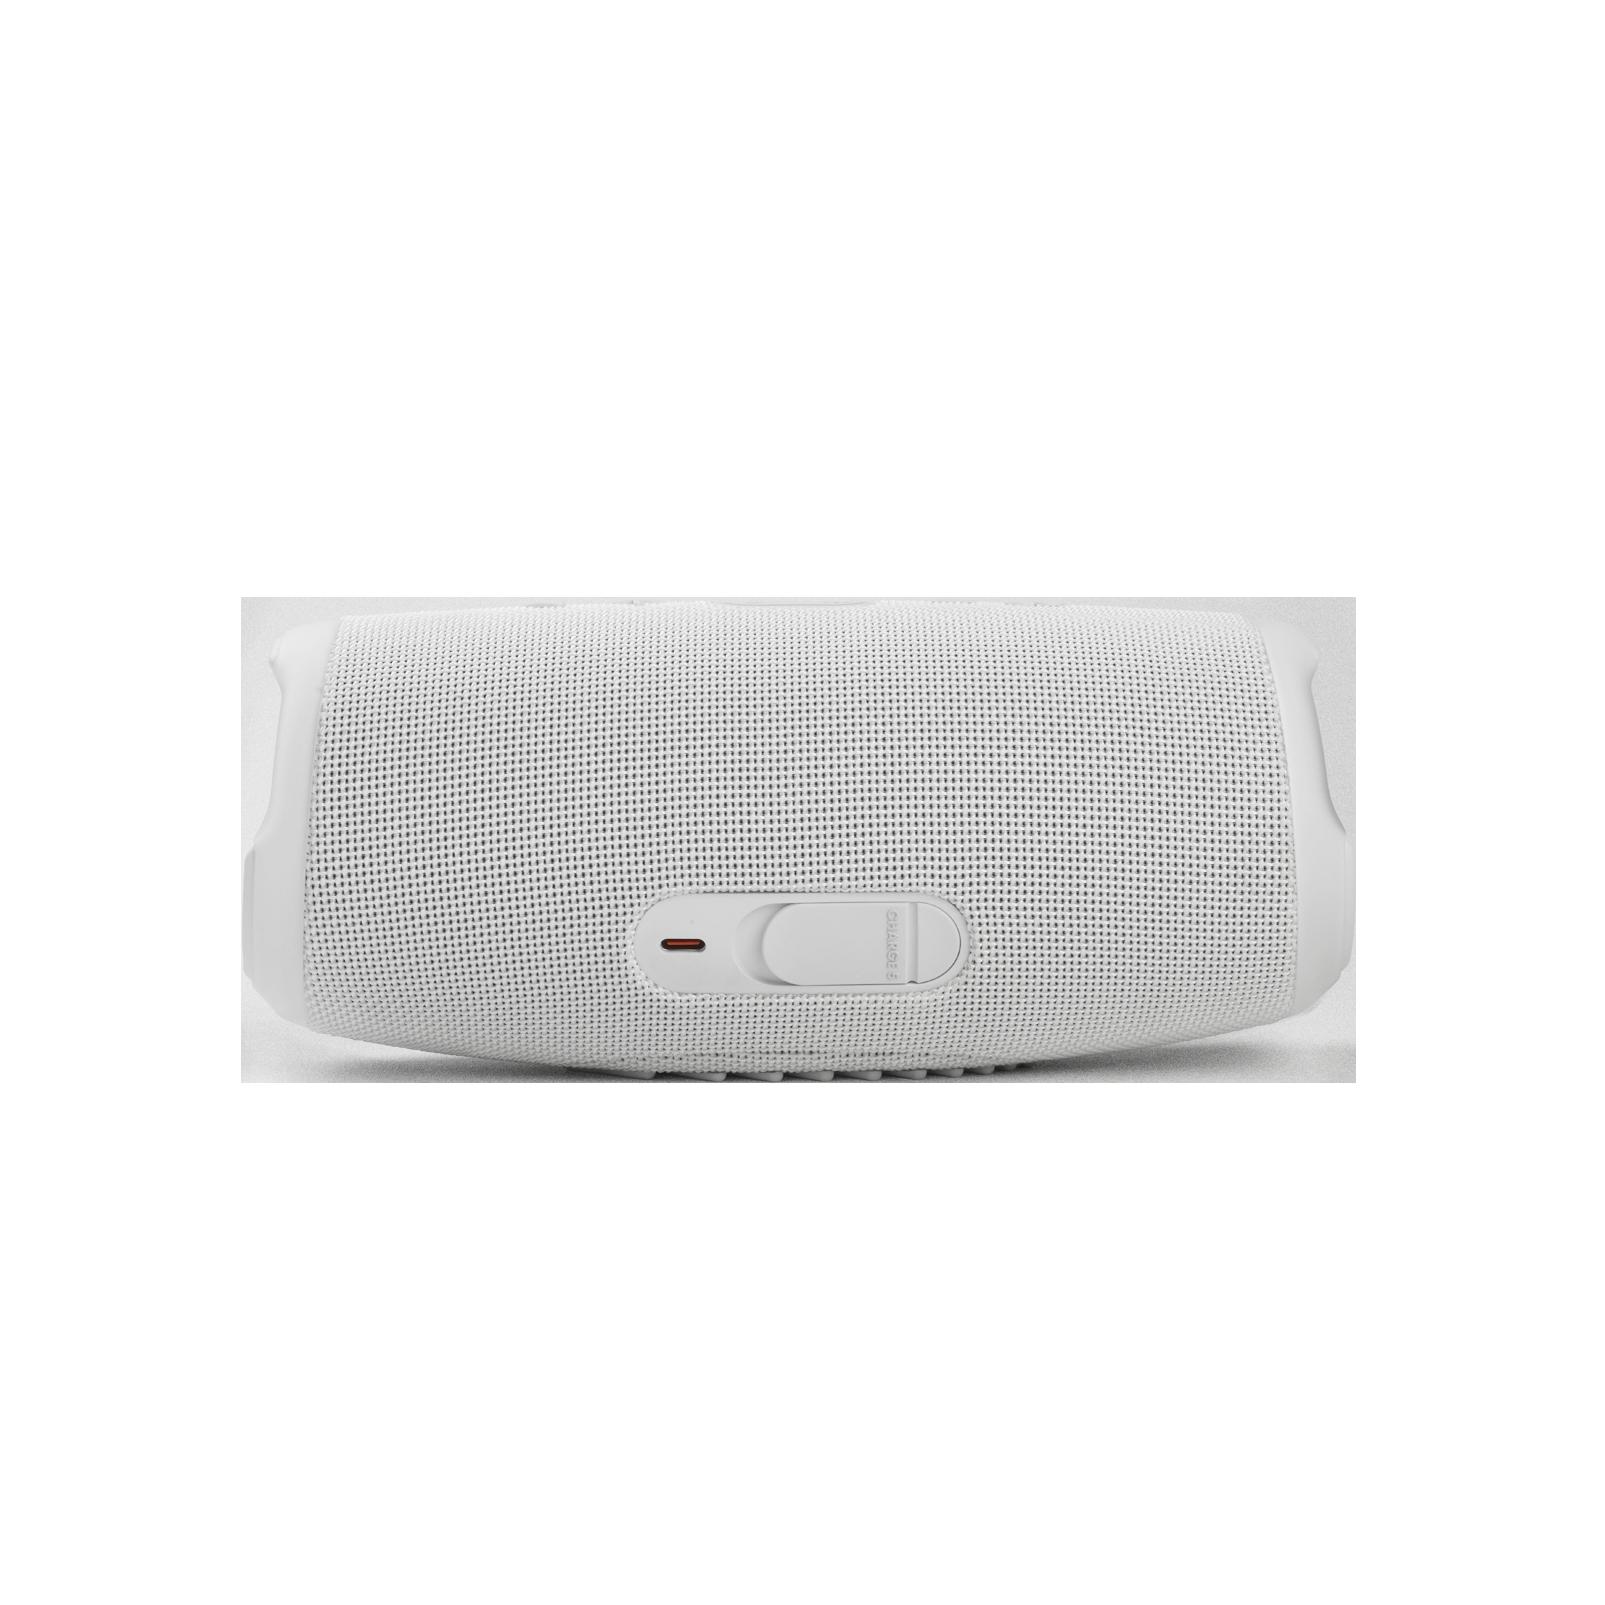 JBL CHARGE 5 - White - Portable Waterproof Speaker with Powerbank - Back